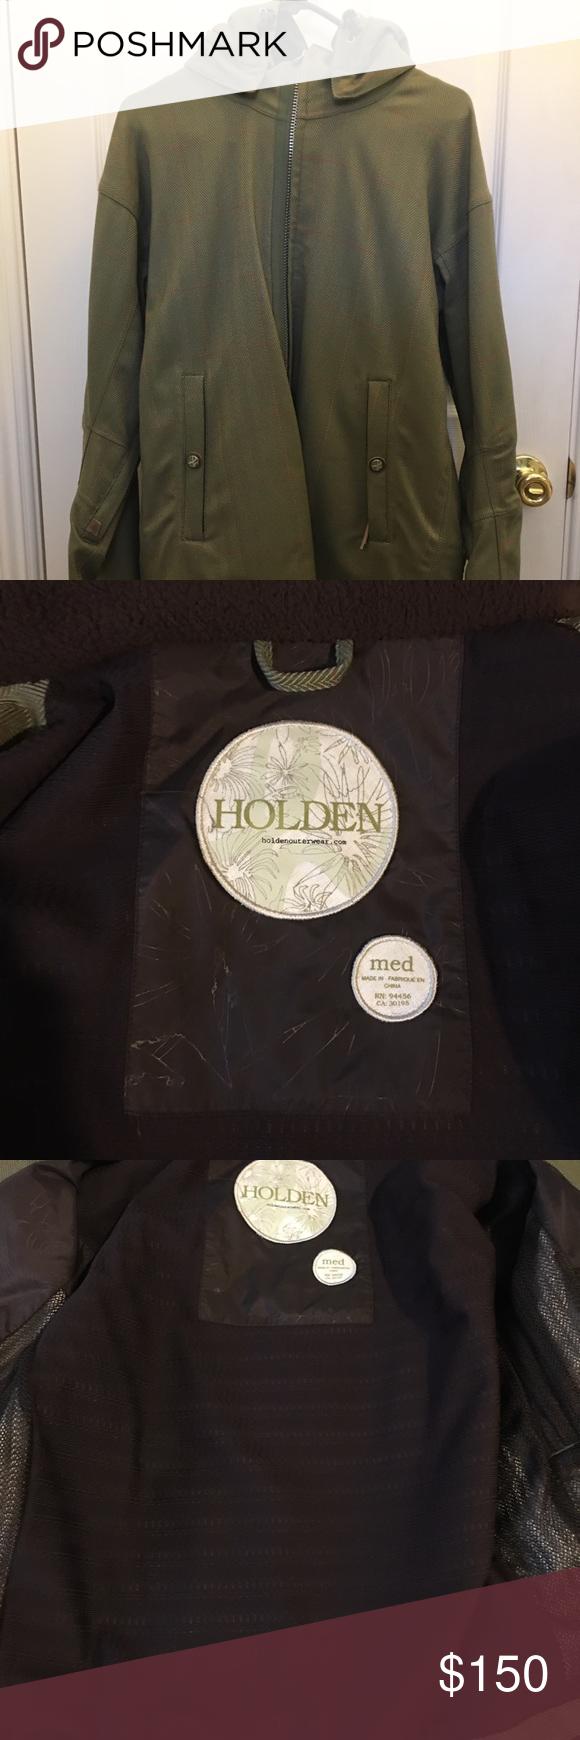 Holden Snowboard Jacket Jackets Snowboard Jacket Holden Jackets [ 1740 x 580 Pixel ]